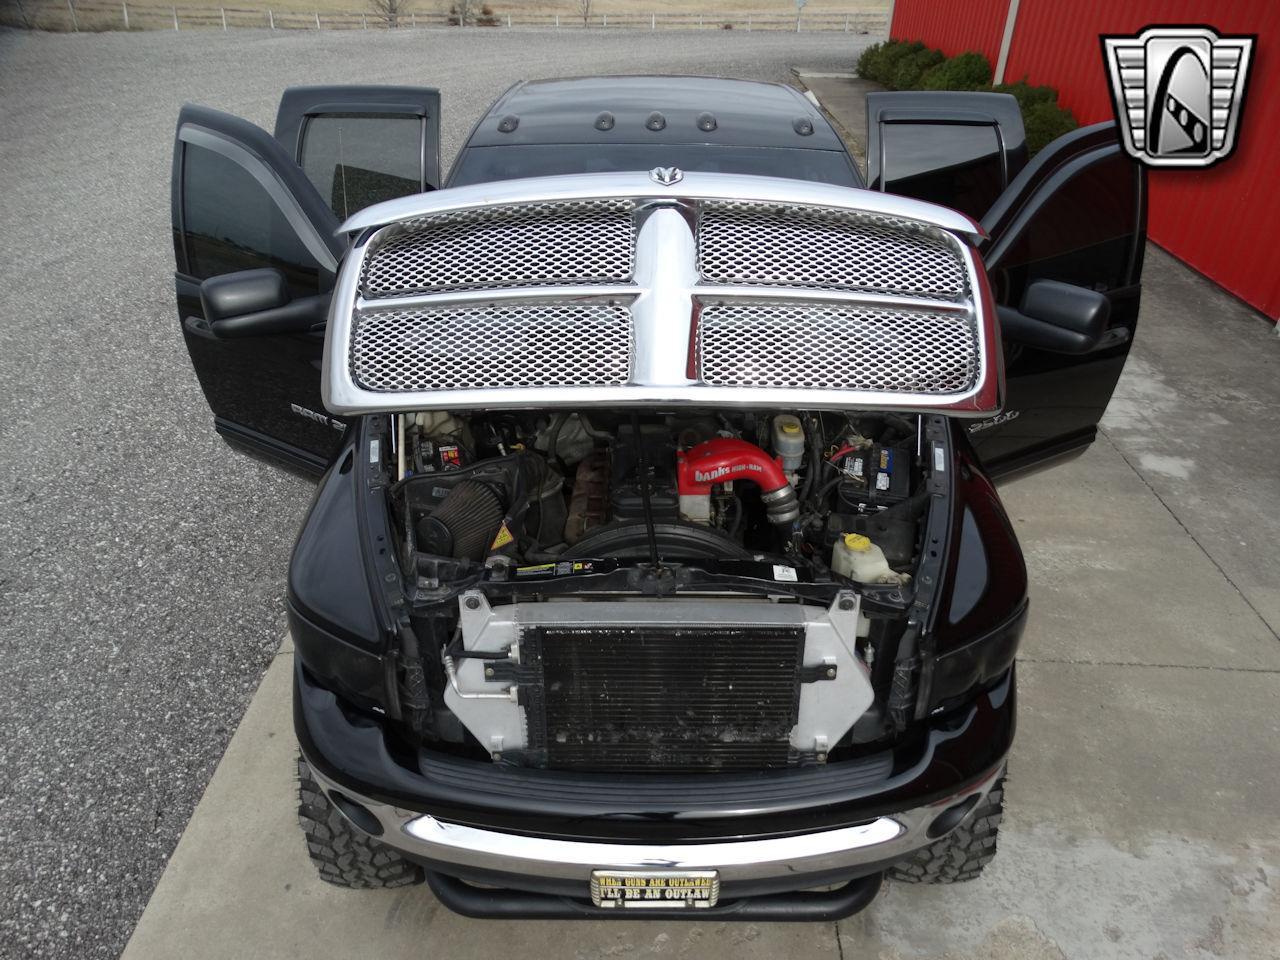 2005 Dodge Ram 94